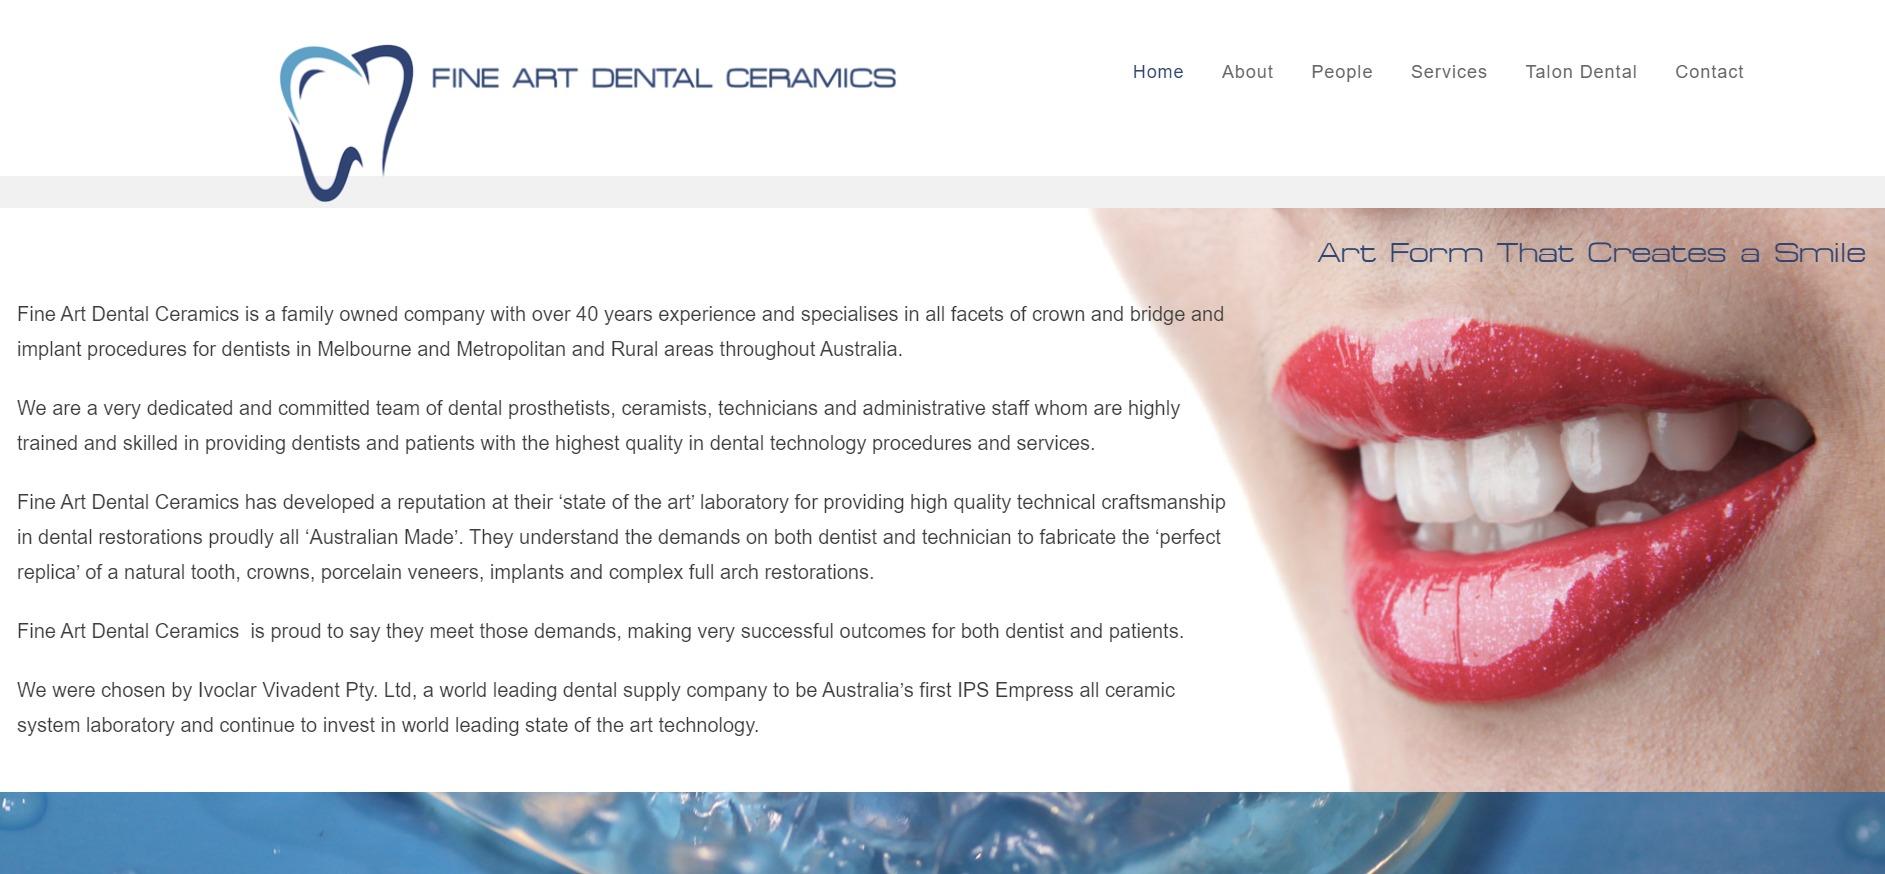 Fine Art Dental Ceramics